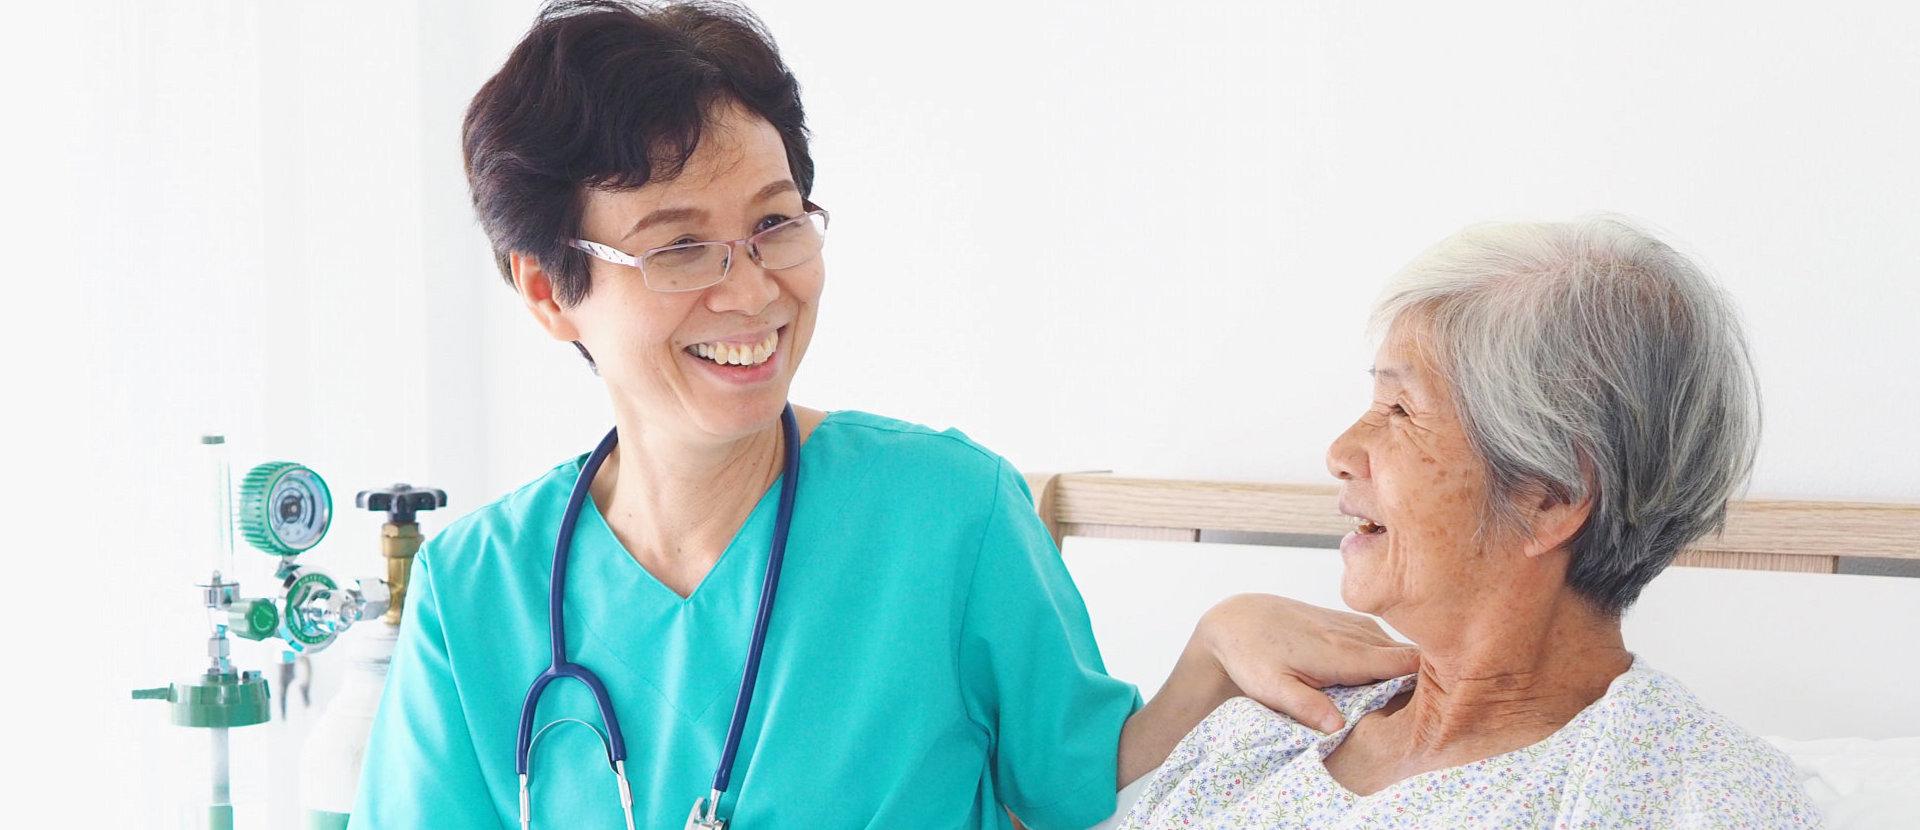 Nurse taking care elderly woman in room of hospital